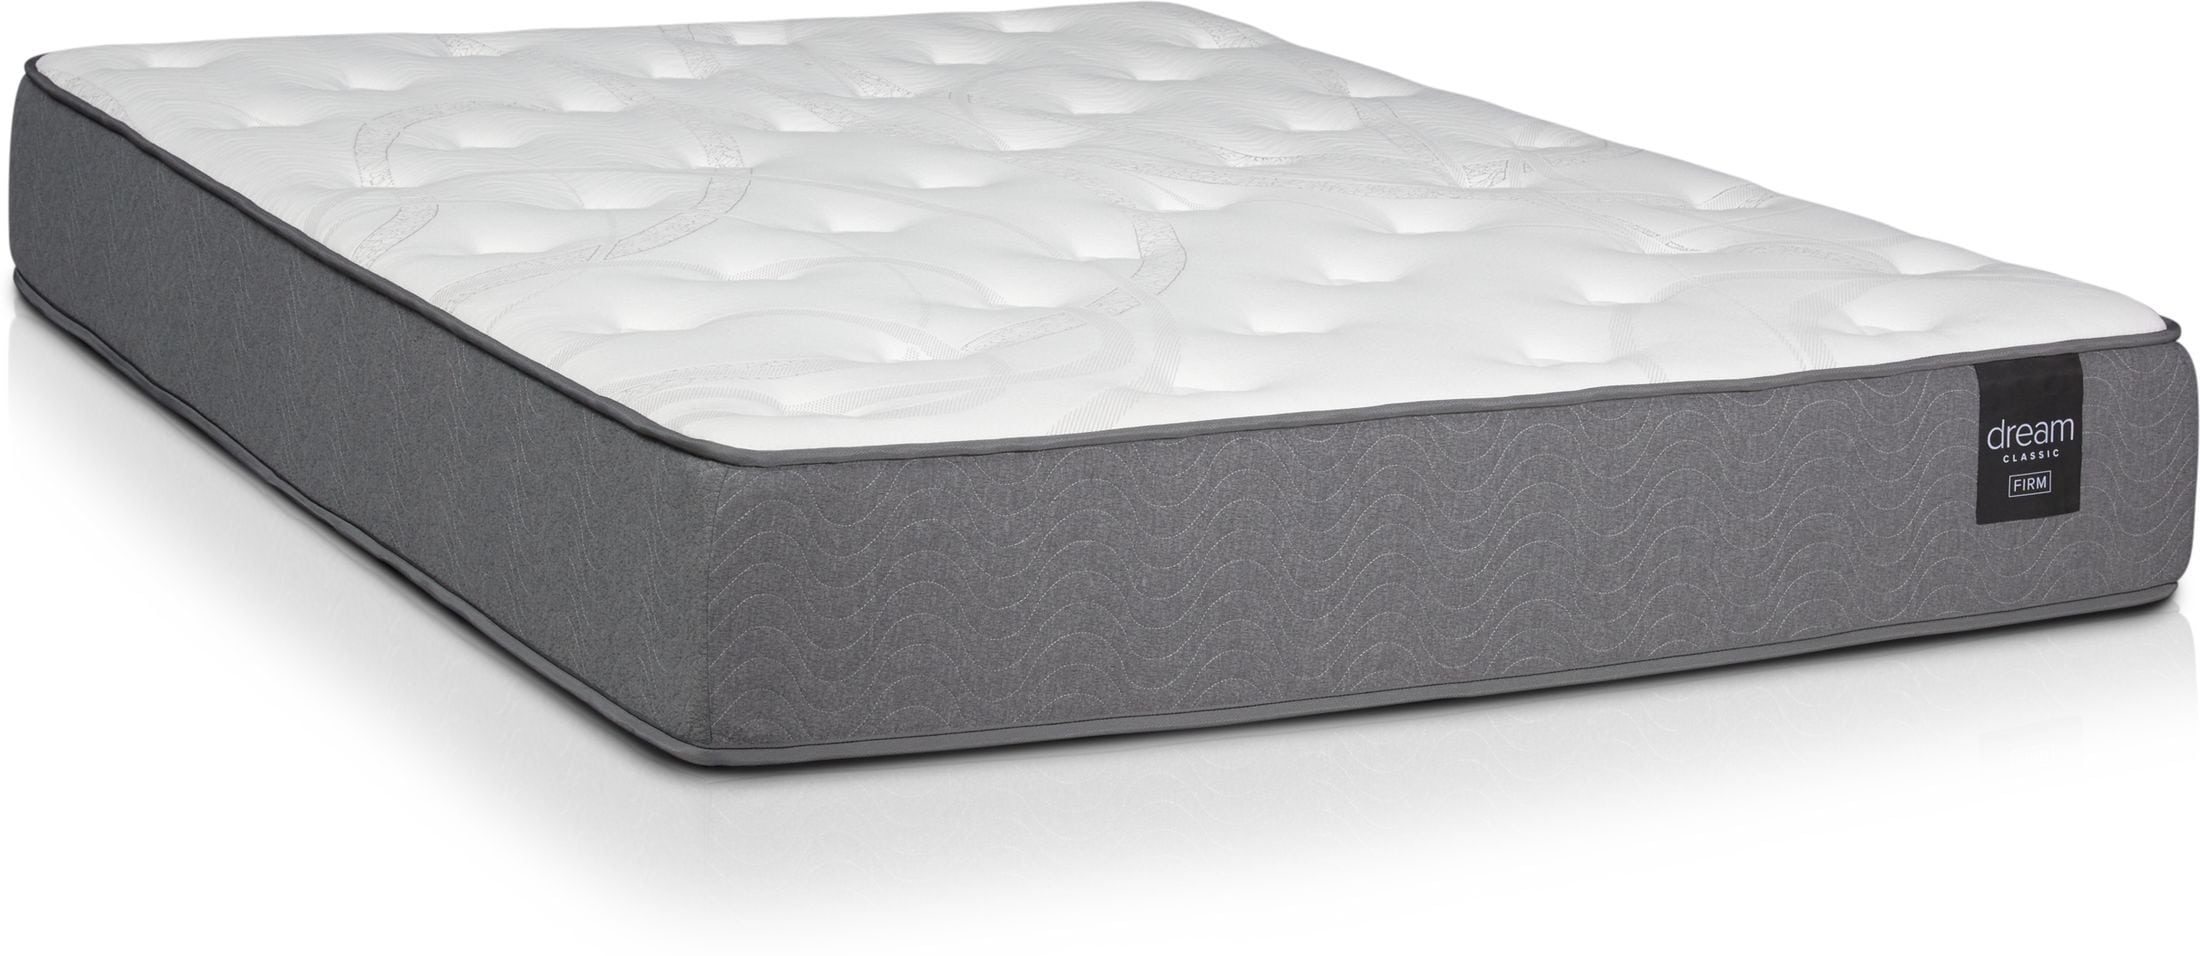 Mattresses and Bedding - Dream-In-A-Box Classic Firm  Mattress